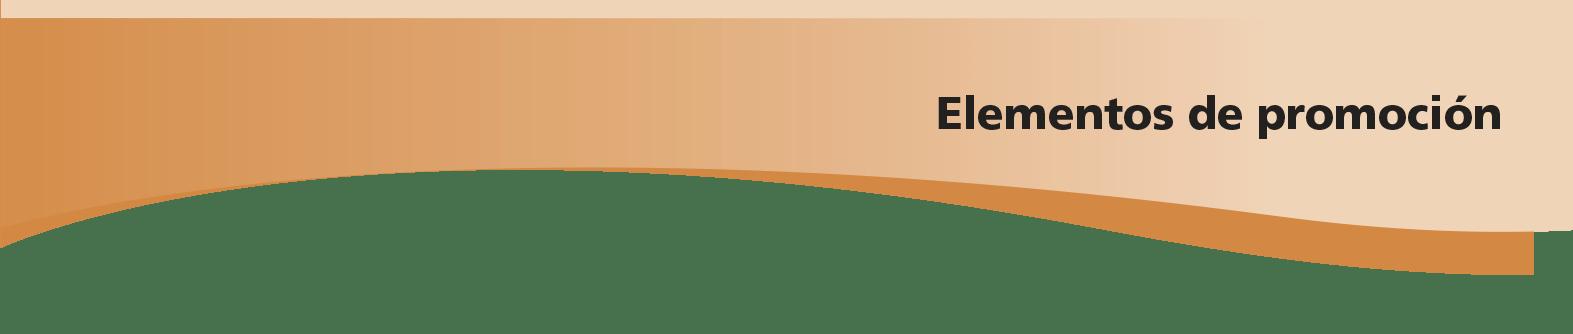 elementos-de-promocionl